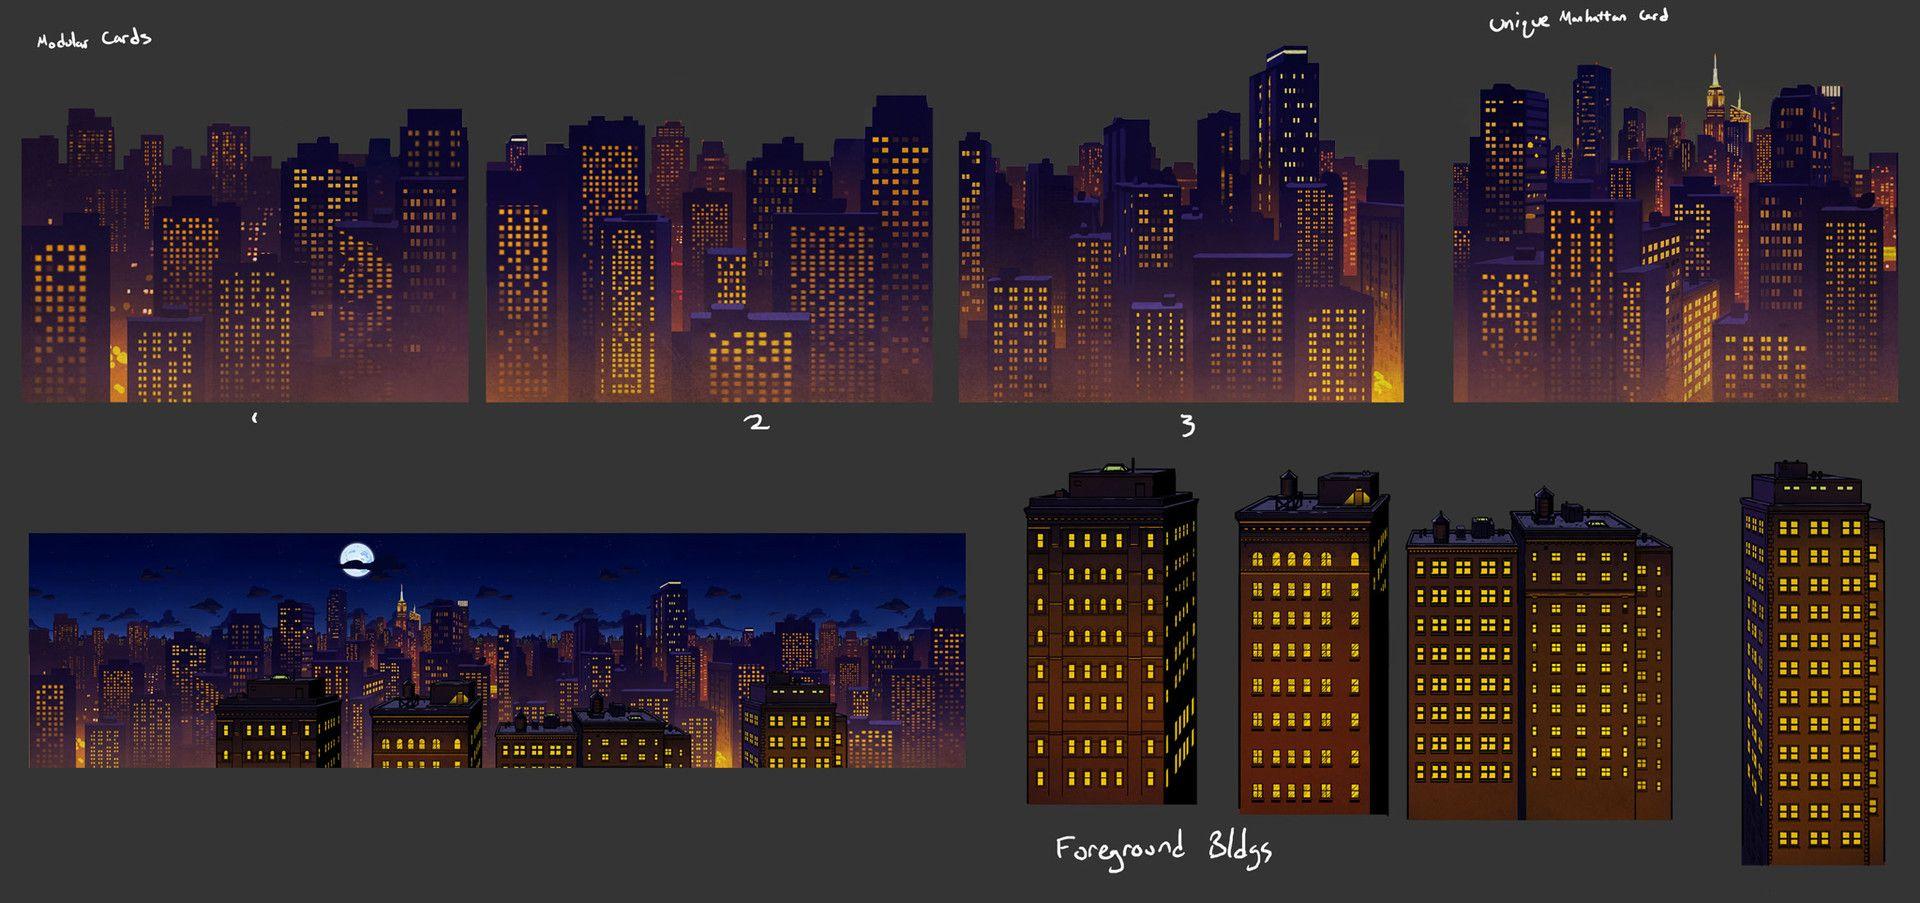 Artstation The Wolf Among Us Concept Art Gray Rogers The Wolf Among Us Concept Art City Illustration